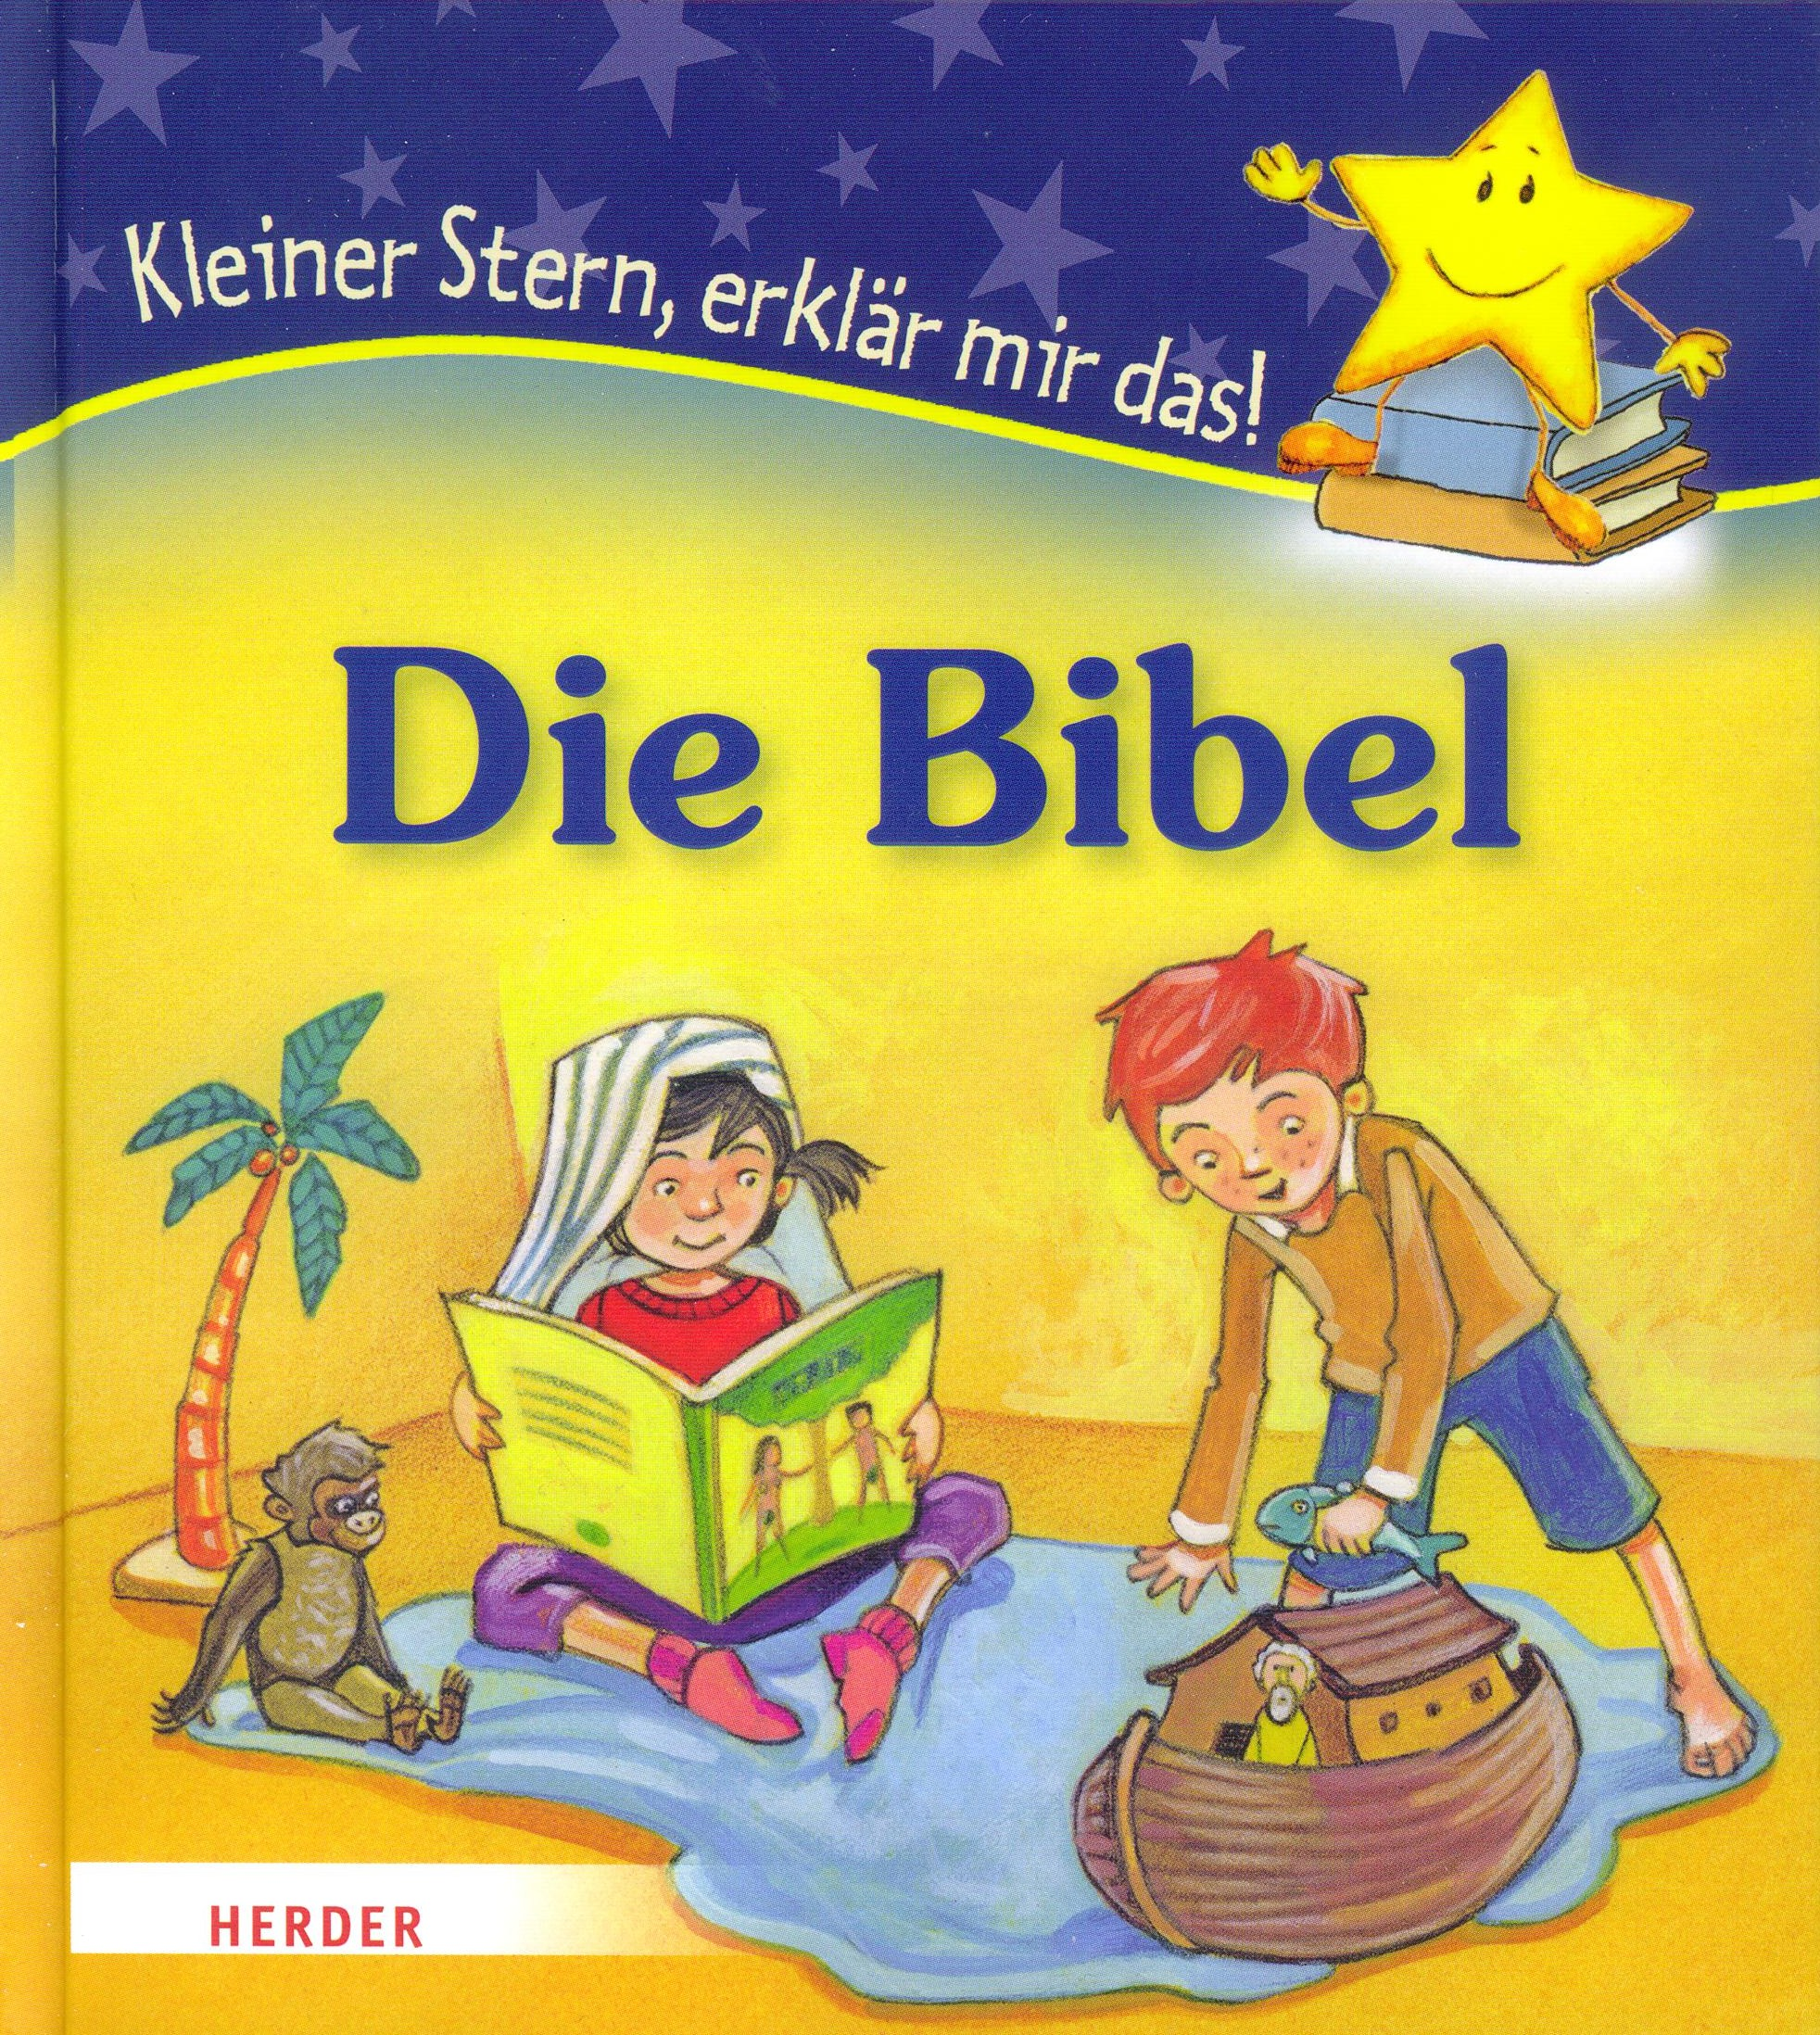 verschüttete zeugen der bibel